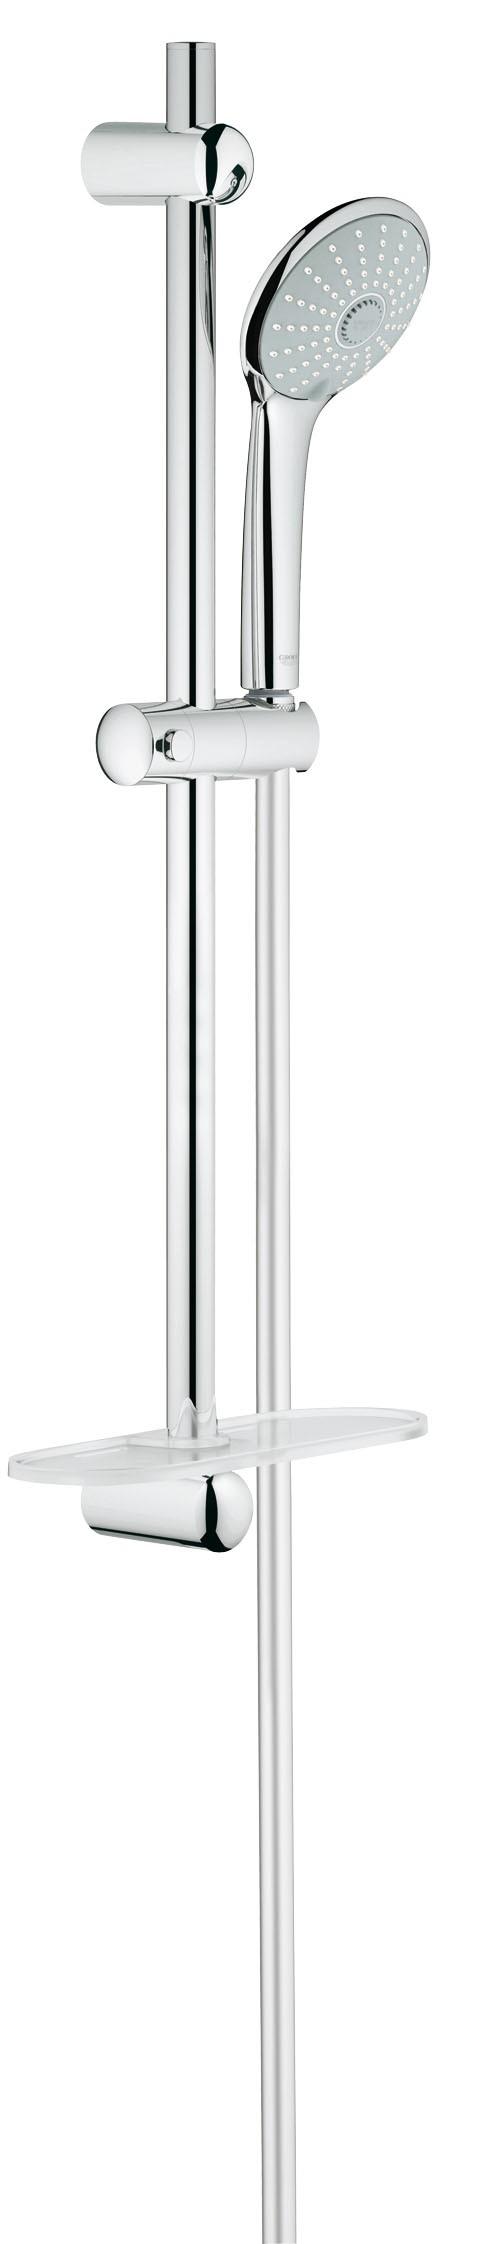 Grohe 27243001 Euphoria (ручной душ, штанга 600 мм, шланг 1500 мм), хром (27243001)